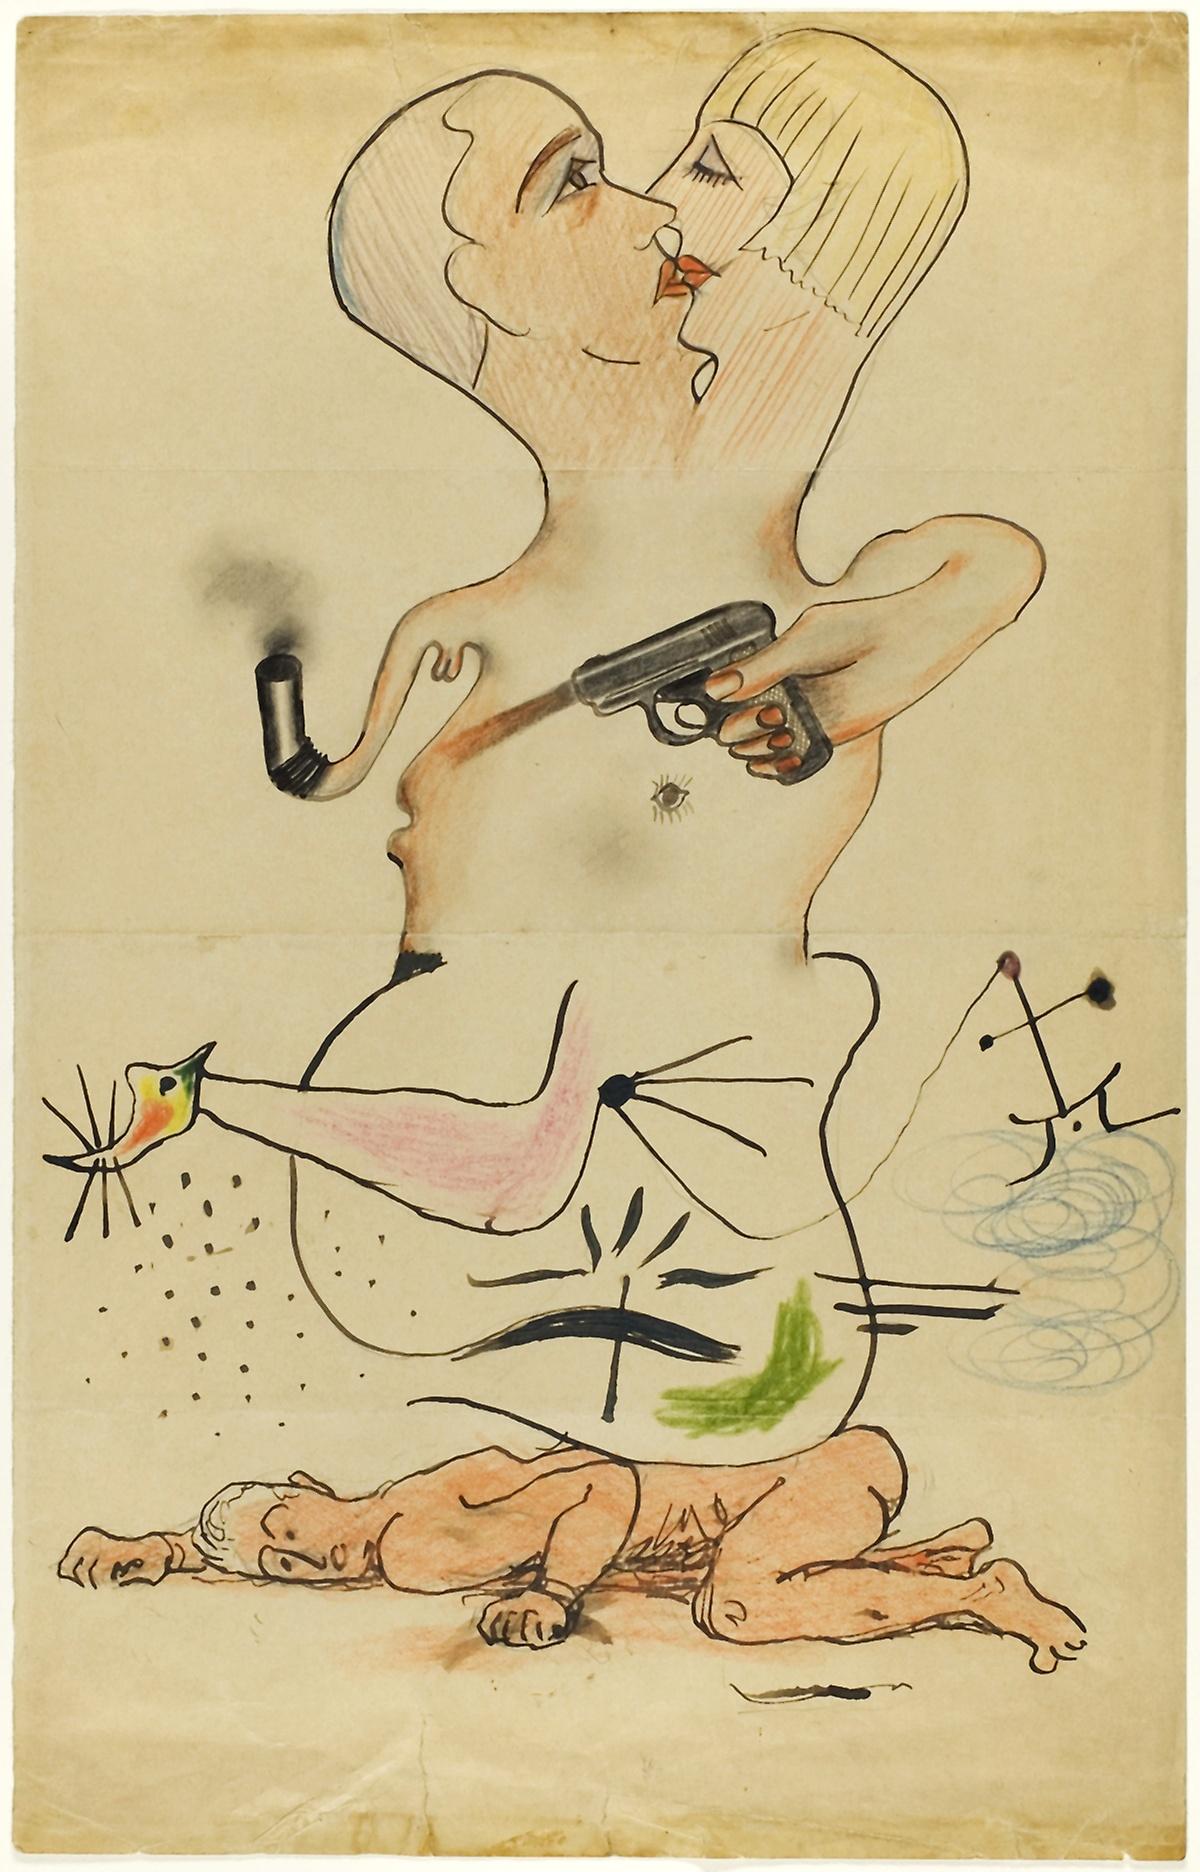 Exquiste Corpse-Man Ray, Joan Miro, Yves Tanguy & Max Morise